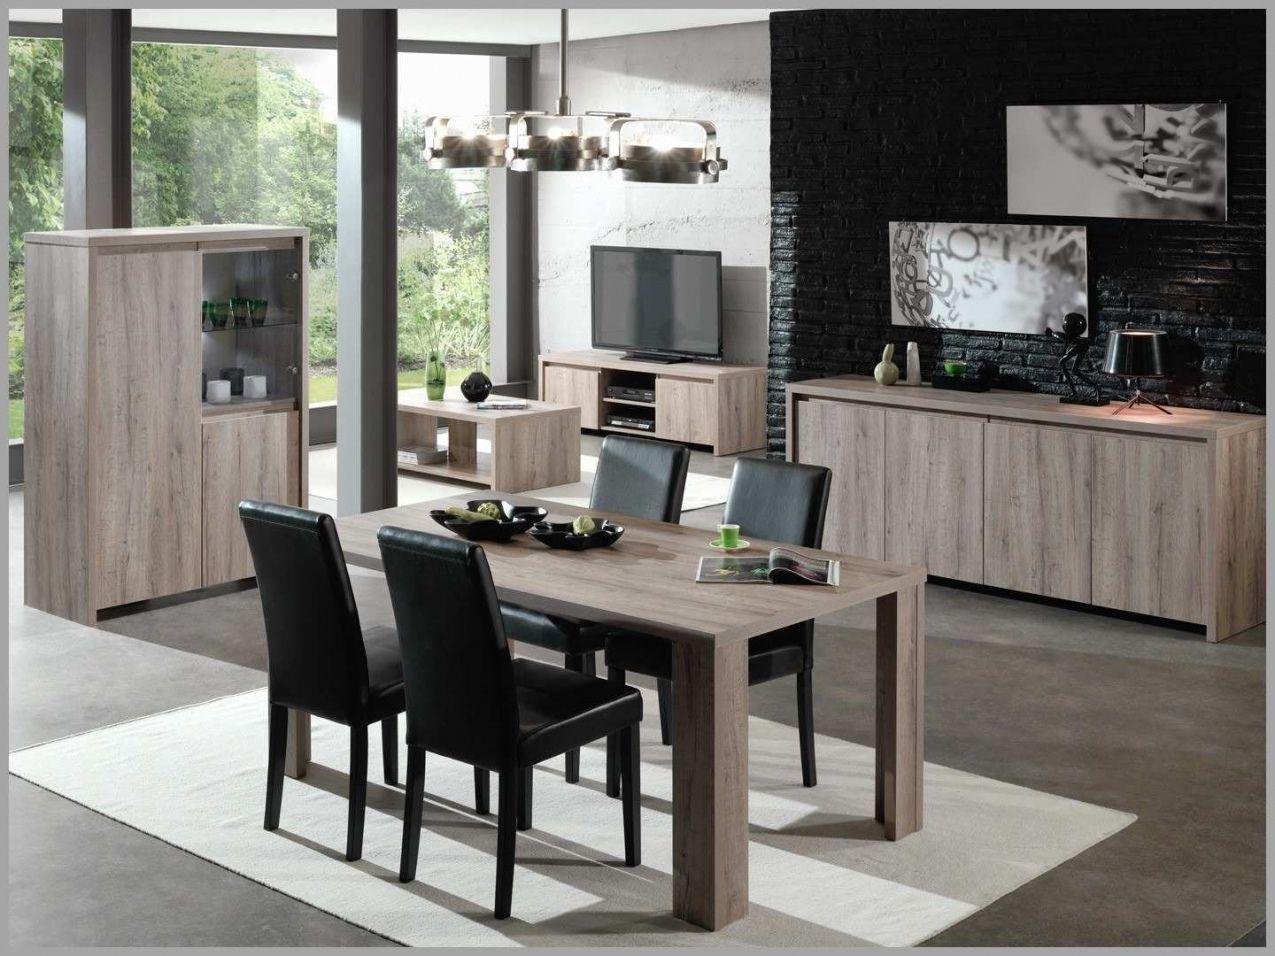 20 Magasin Meuble Belgique Okay 2018 Check More At Https Www Unionjacktrooper Com 201 Magasin Meuble Belgique Okay 2018 Home Home Decor Furniture